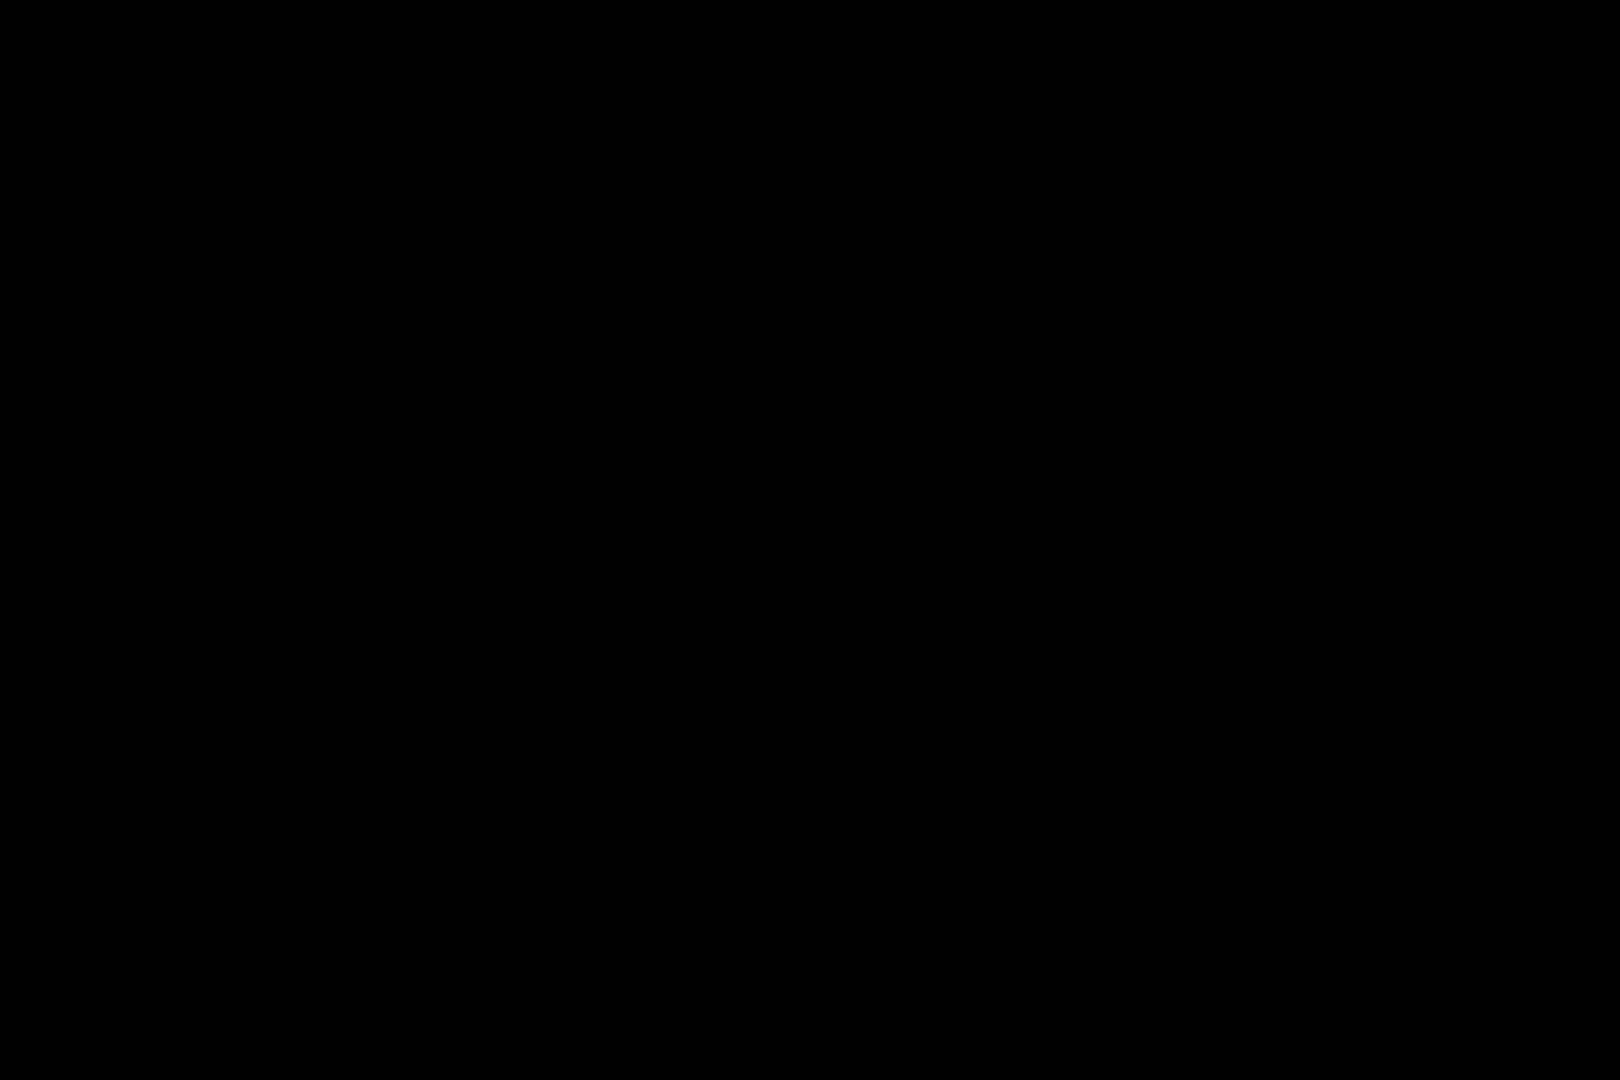 充血監督の深夜の運動会Vol.16 高画質  103枚 49